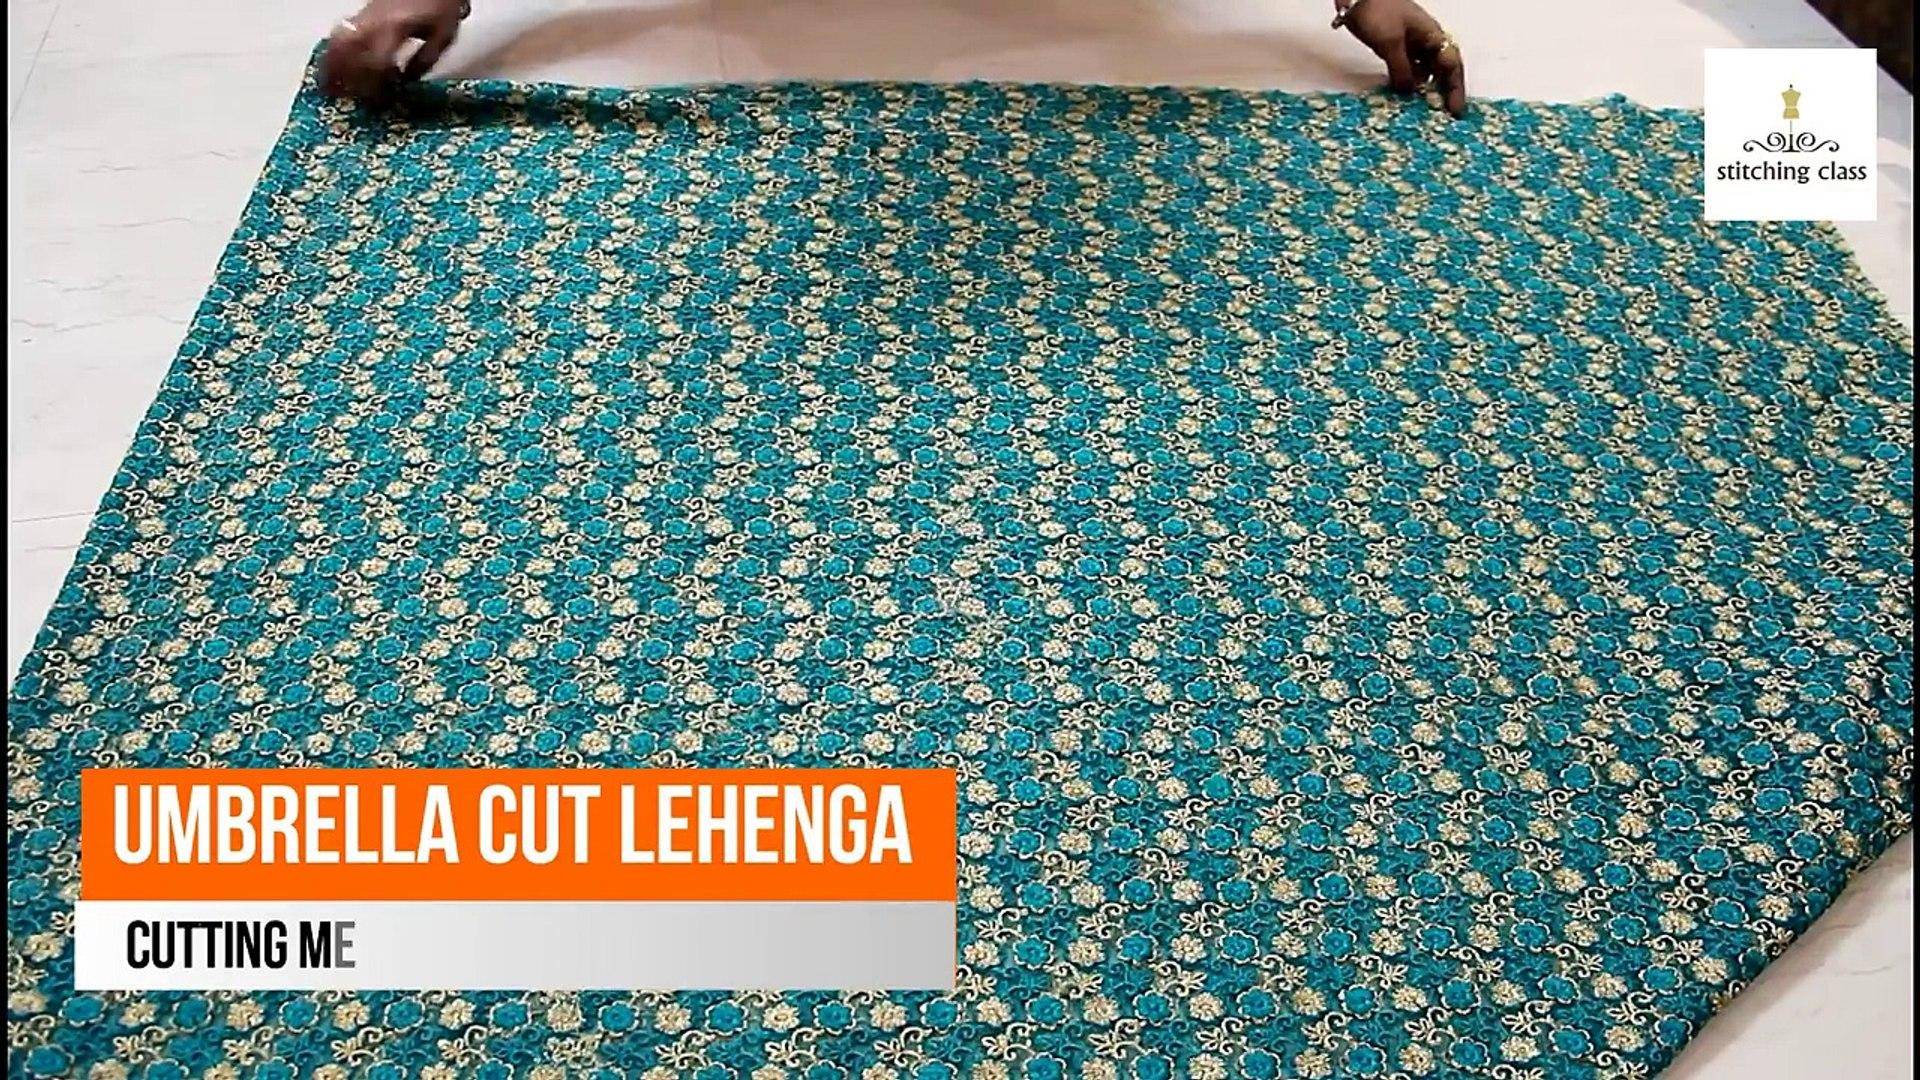 Umbrella Cut Lehenga Cutting and Stitching